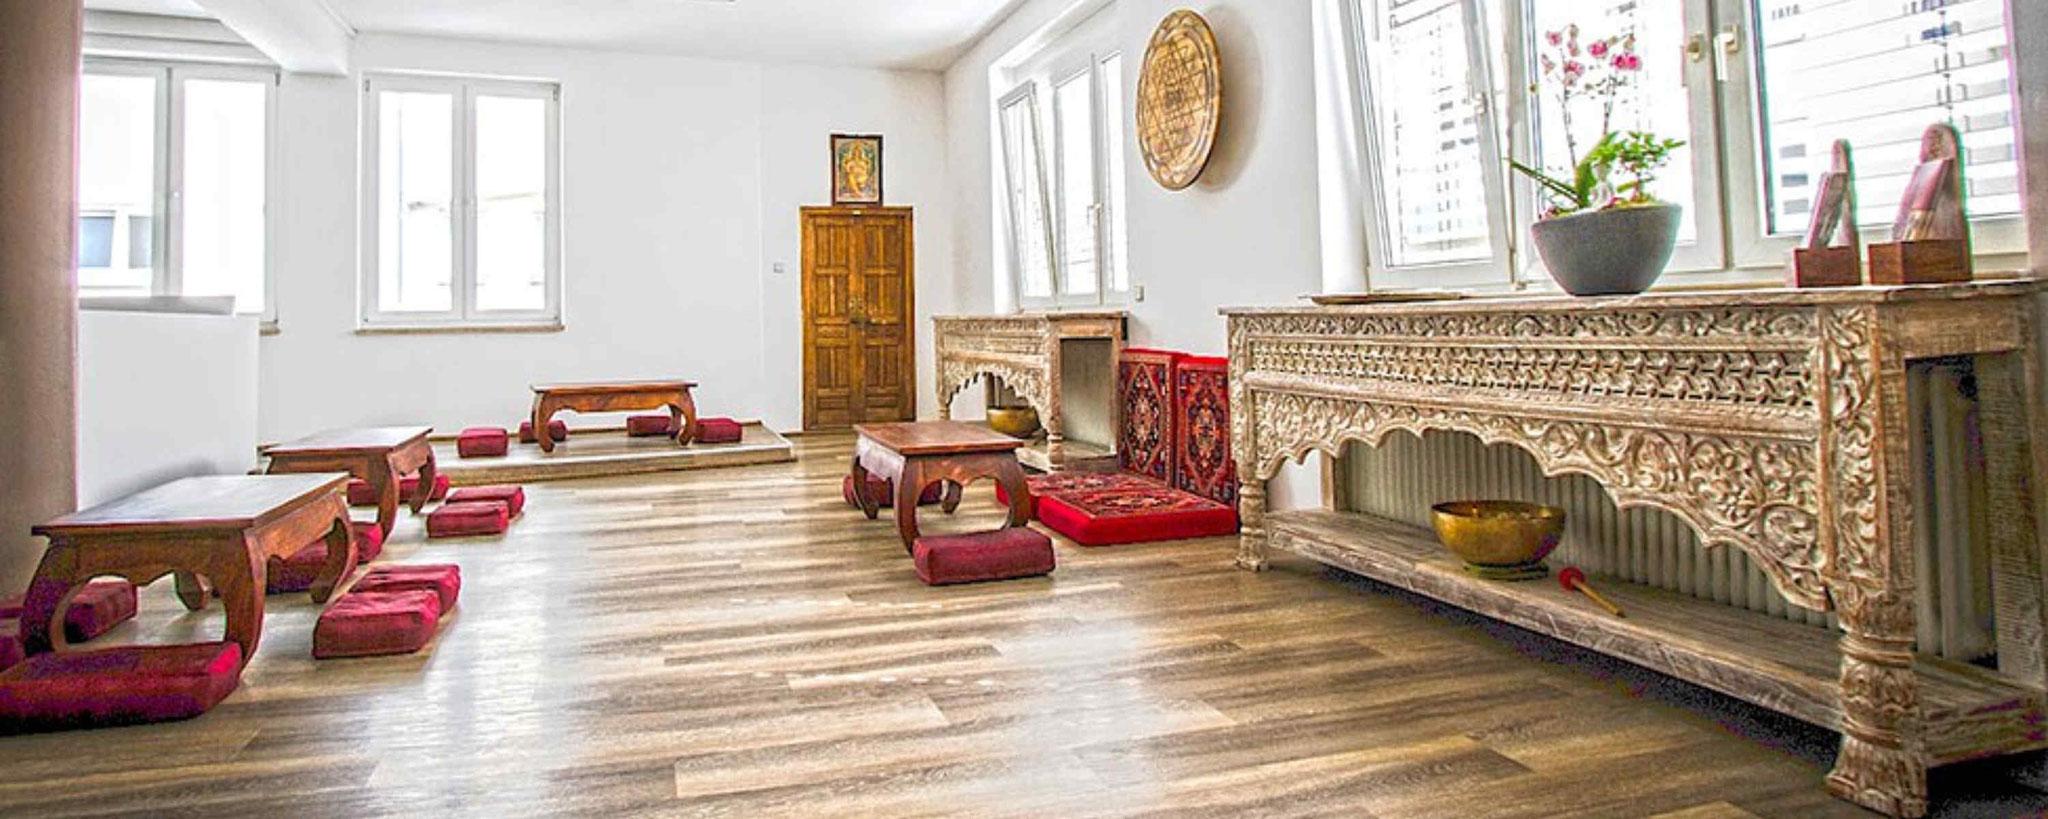 samsara yoga yoga kurse kinderyoga im zentrum von. Black Bedroom Furniture Sets. Home Design Ideas